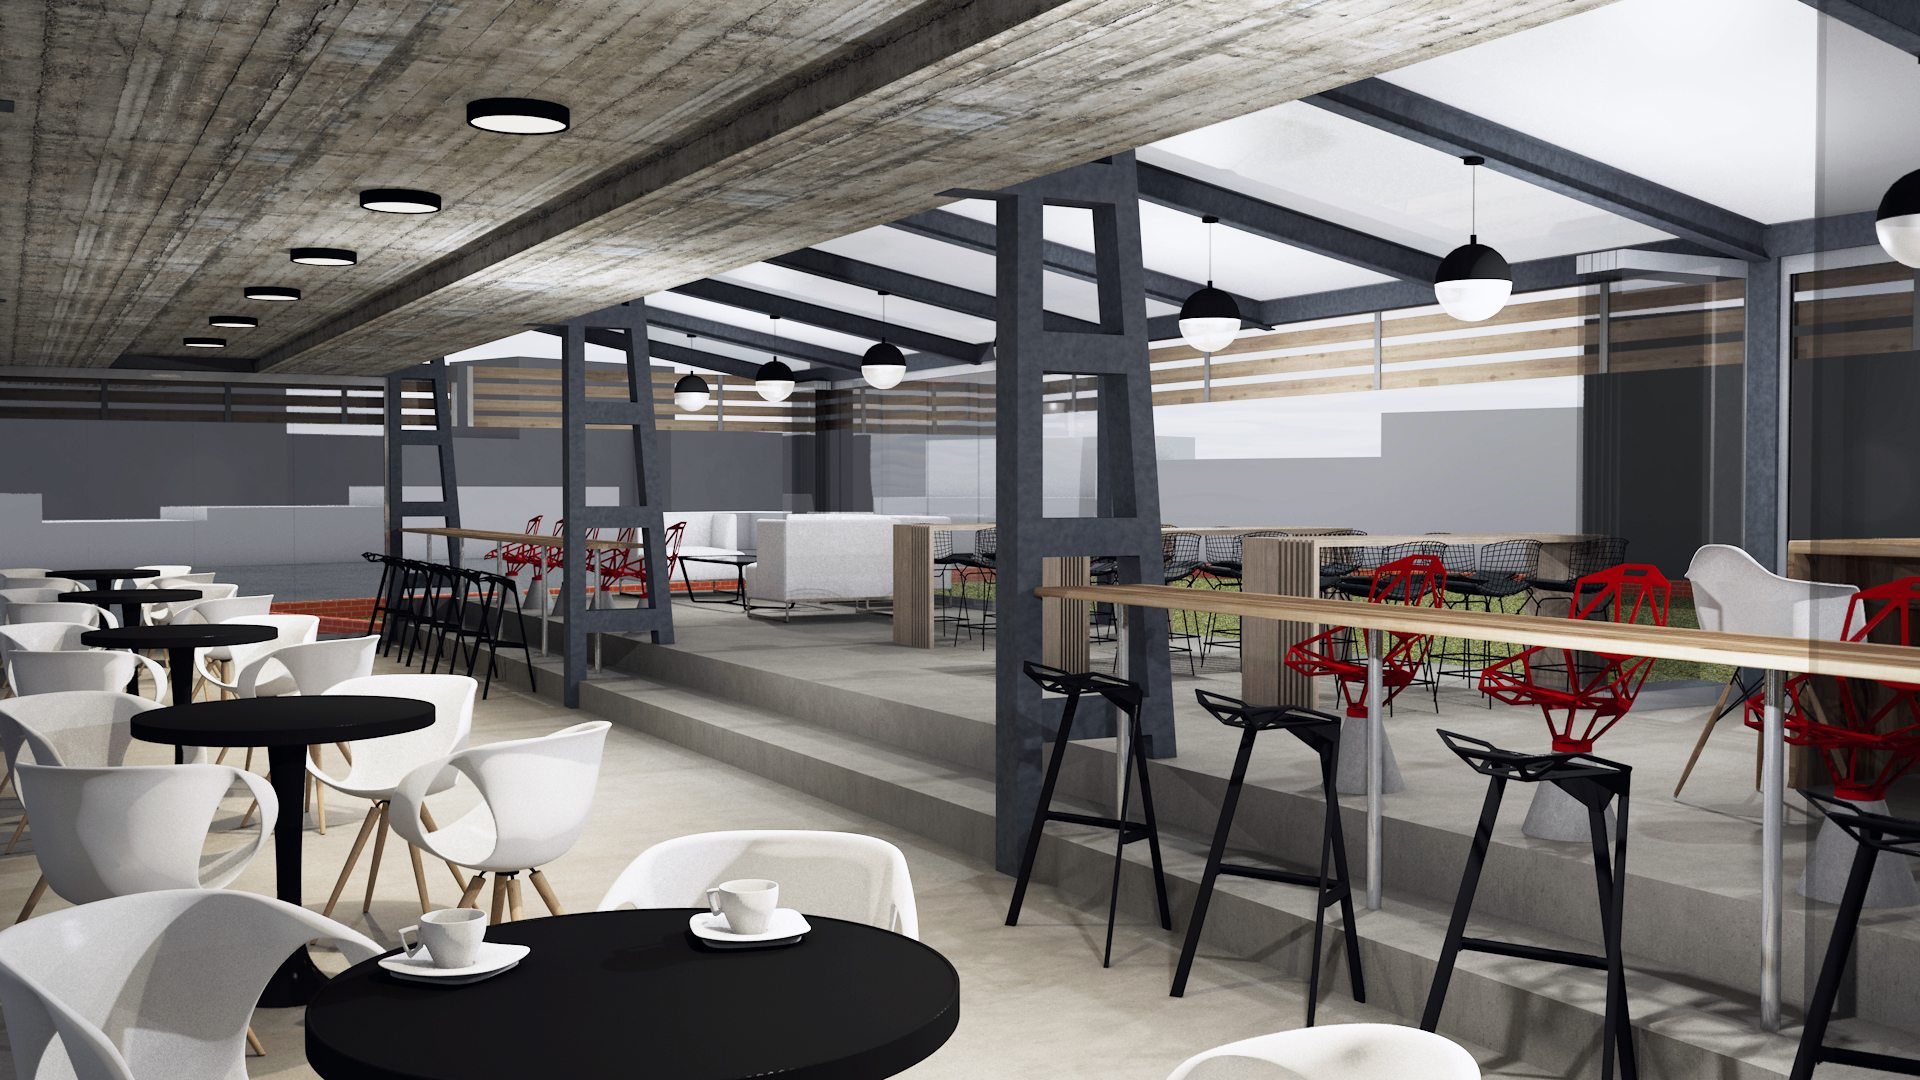 archicostudio_hospital-cafe_lounge-1